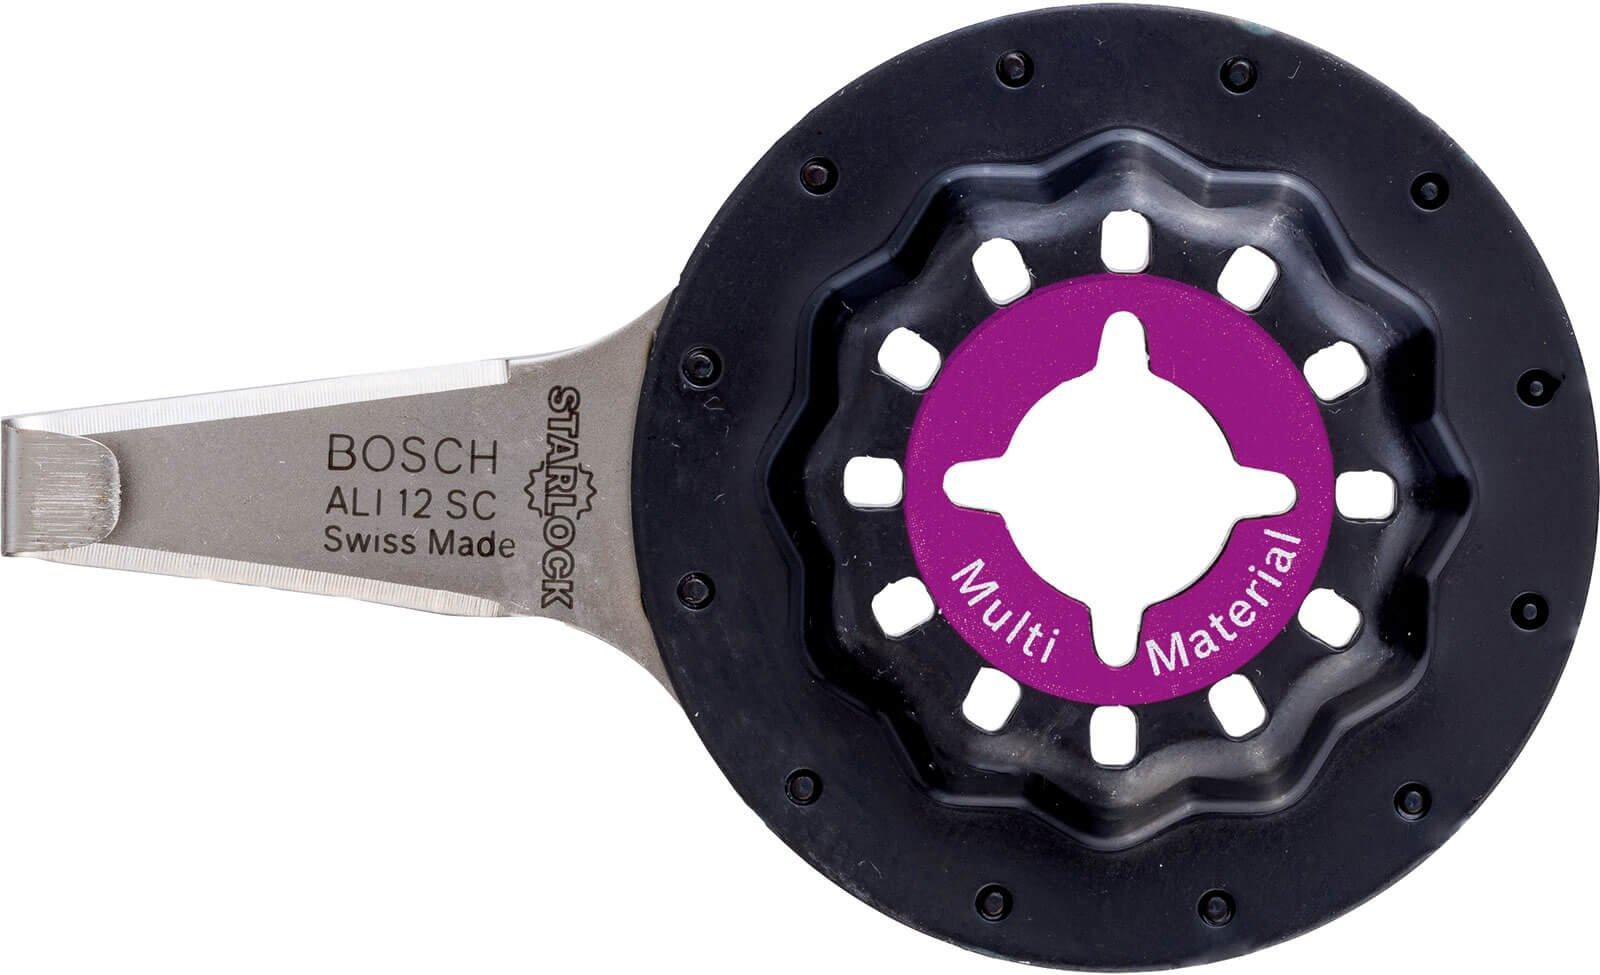 Bosch ALI 12 SC Universal Starlock Oscillating Multi Tool Sealant Remover 4mm Pack of 1